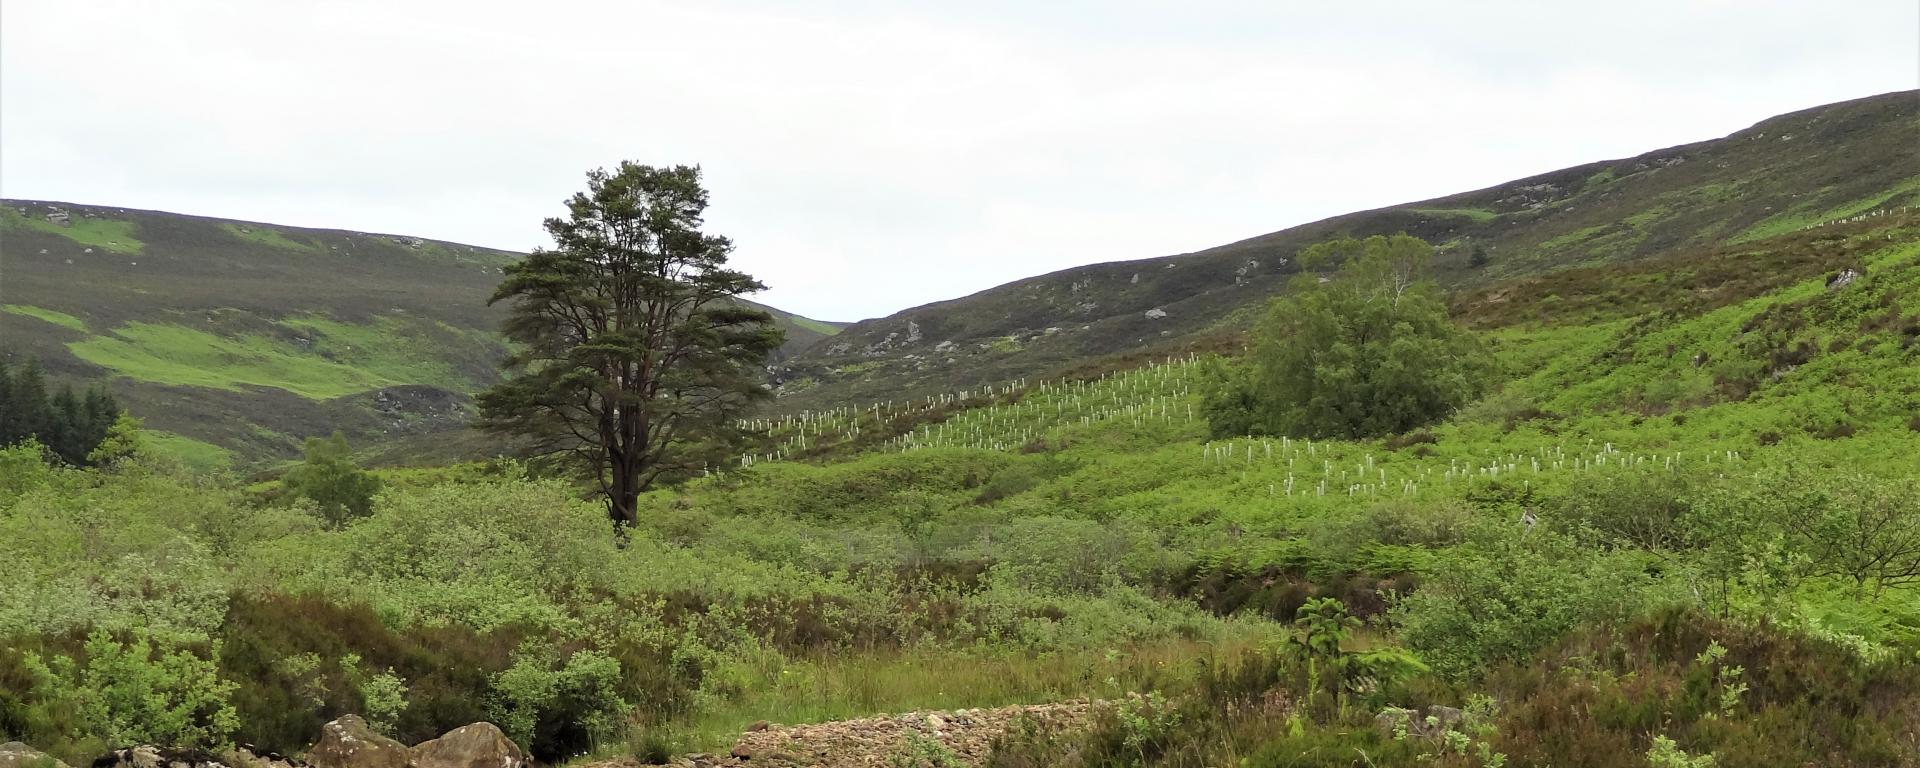 Image of the wildwood area in Northumberland